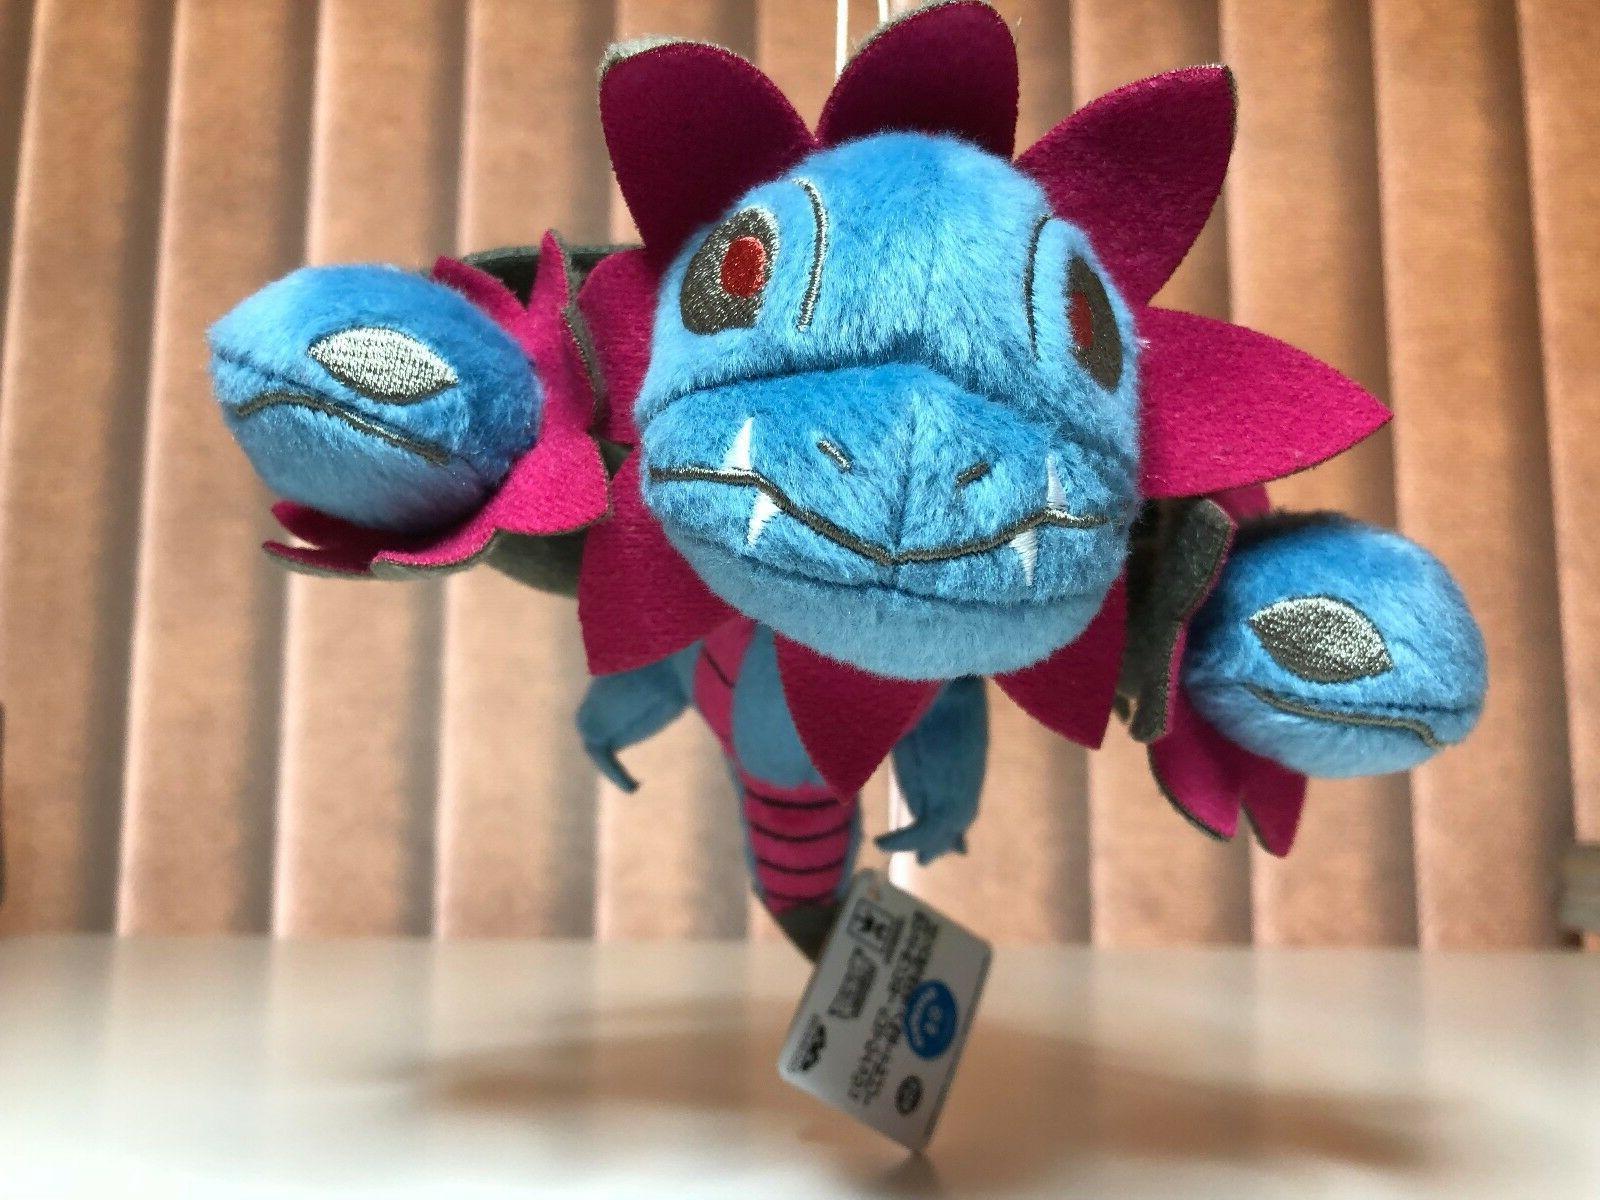 Pokemon Dragon Type Hydreigon Plush Toy Banpresto New w/Tag